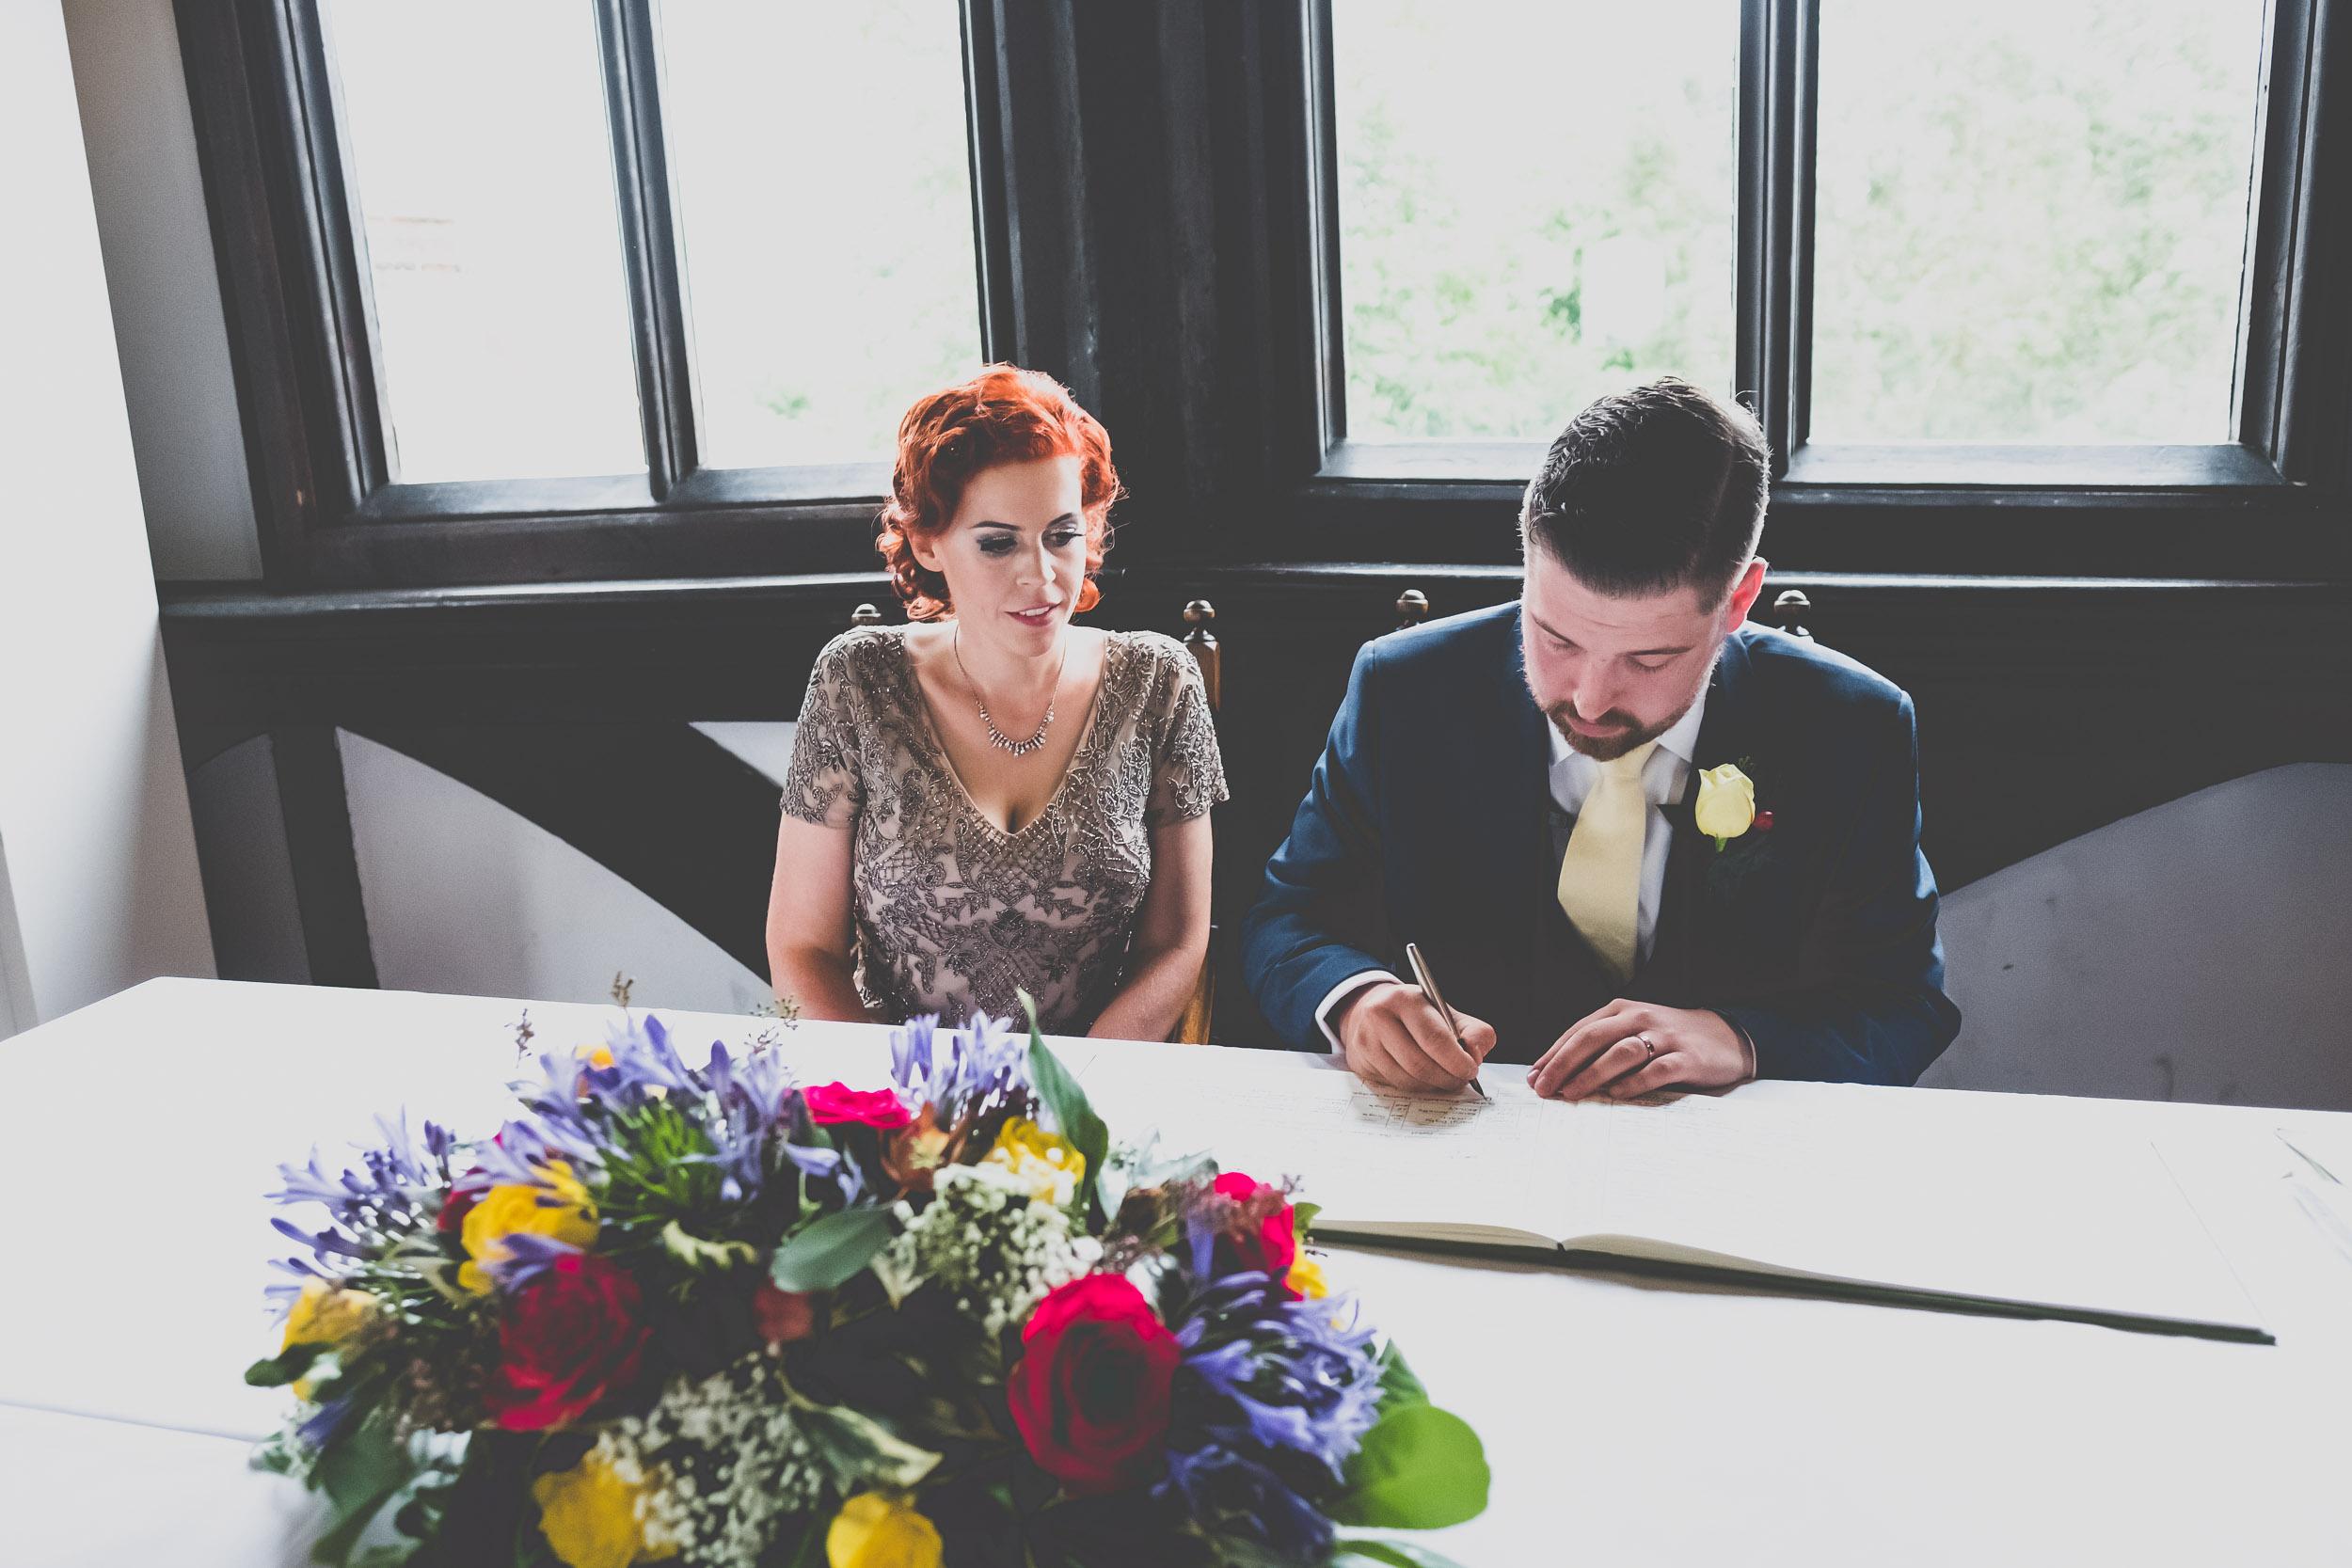 queen-elizabeths-hunting-lodge-epping-forest-wedding111.jpg